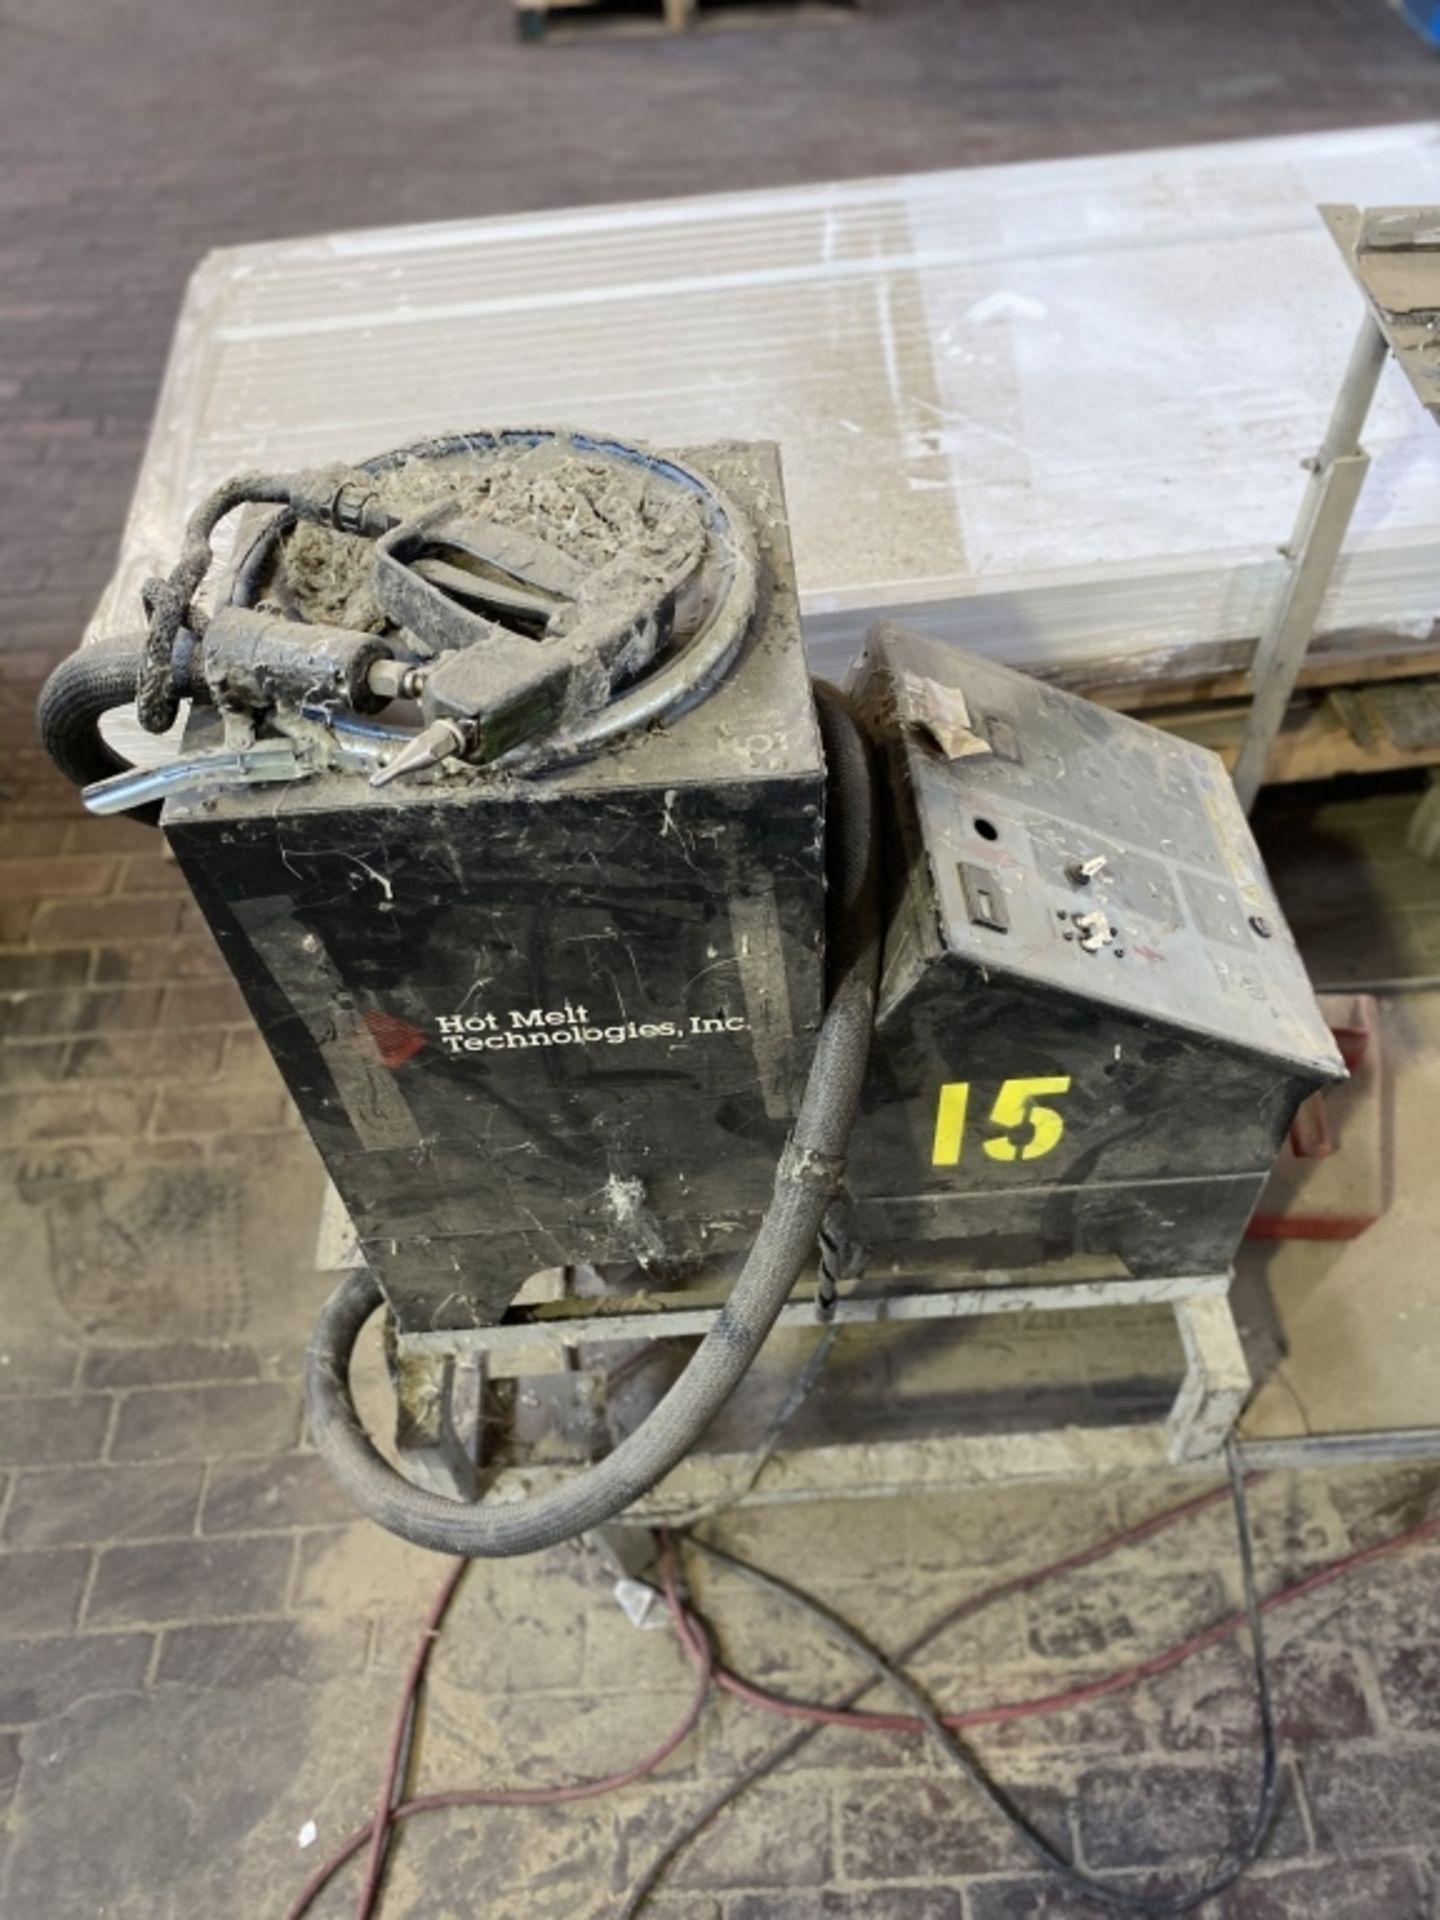 Lot 1006b - Hotmelt Technologies Hot Melt Machine